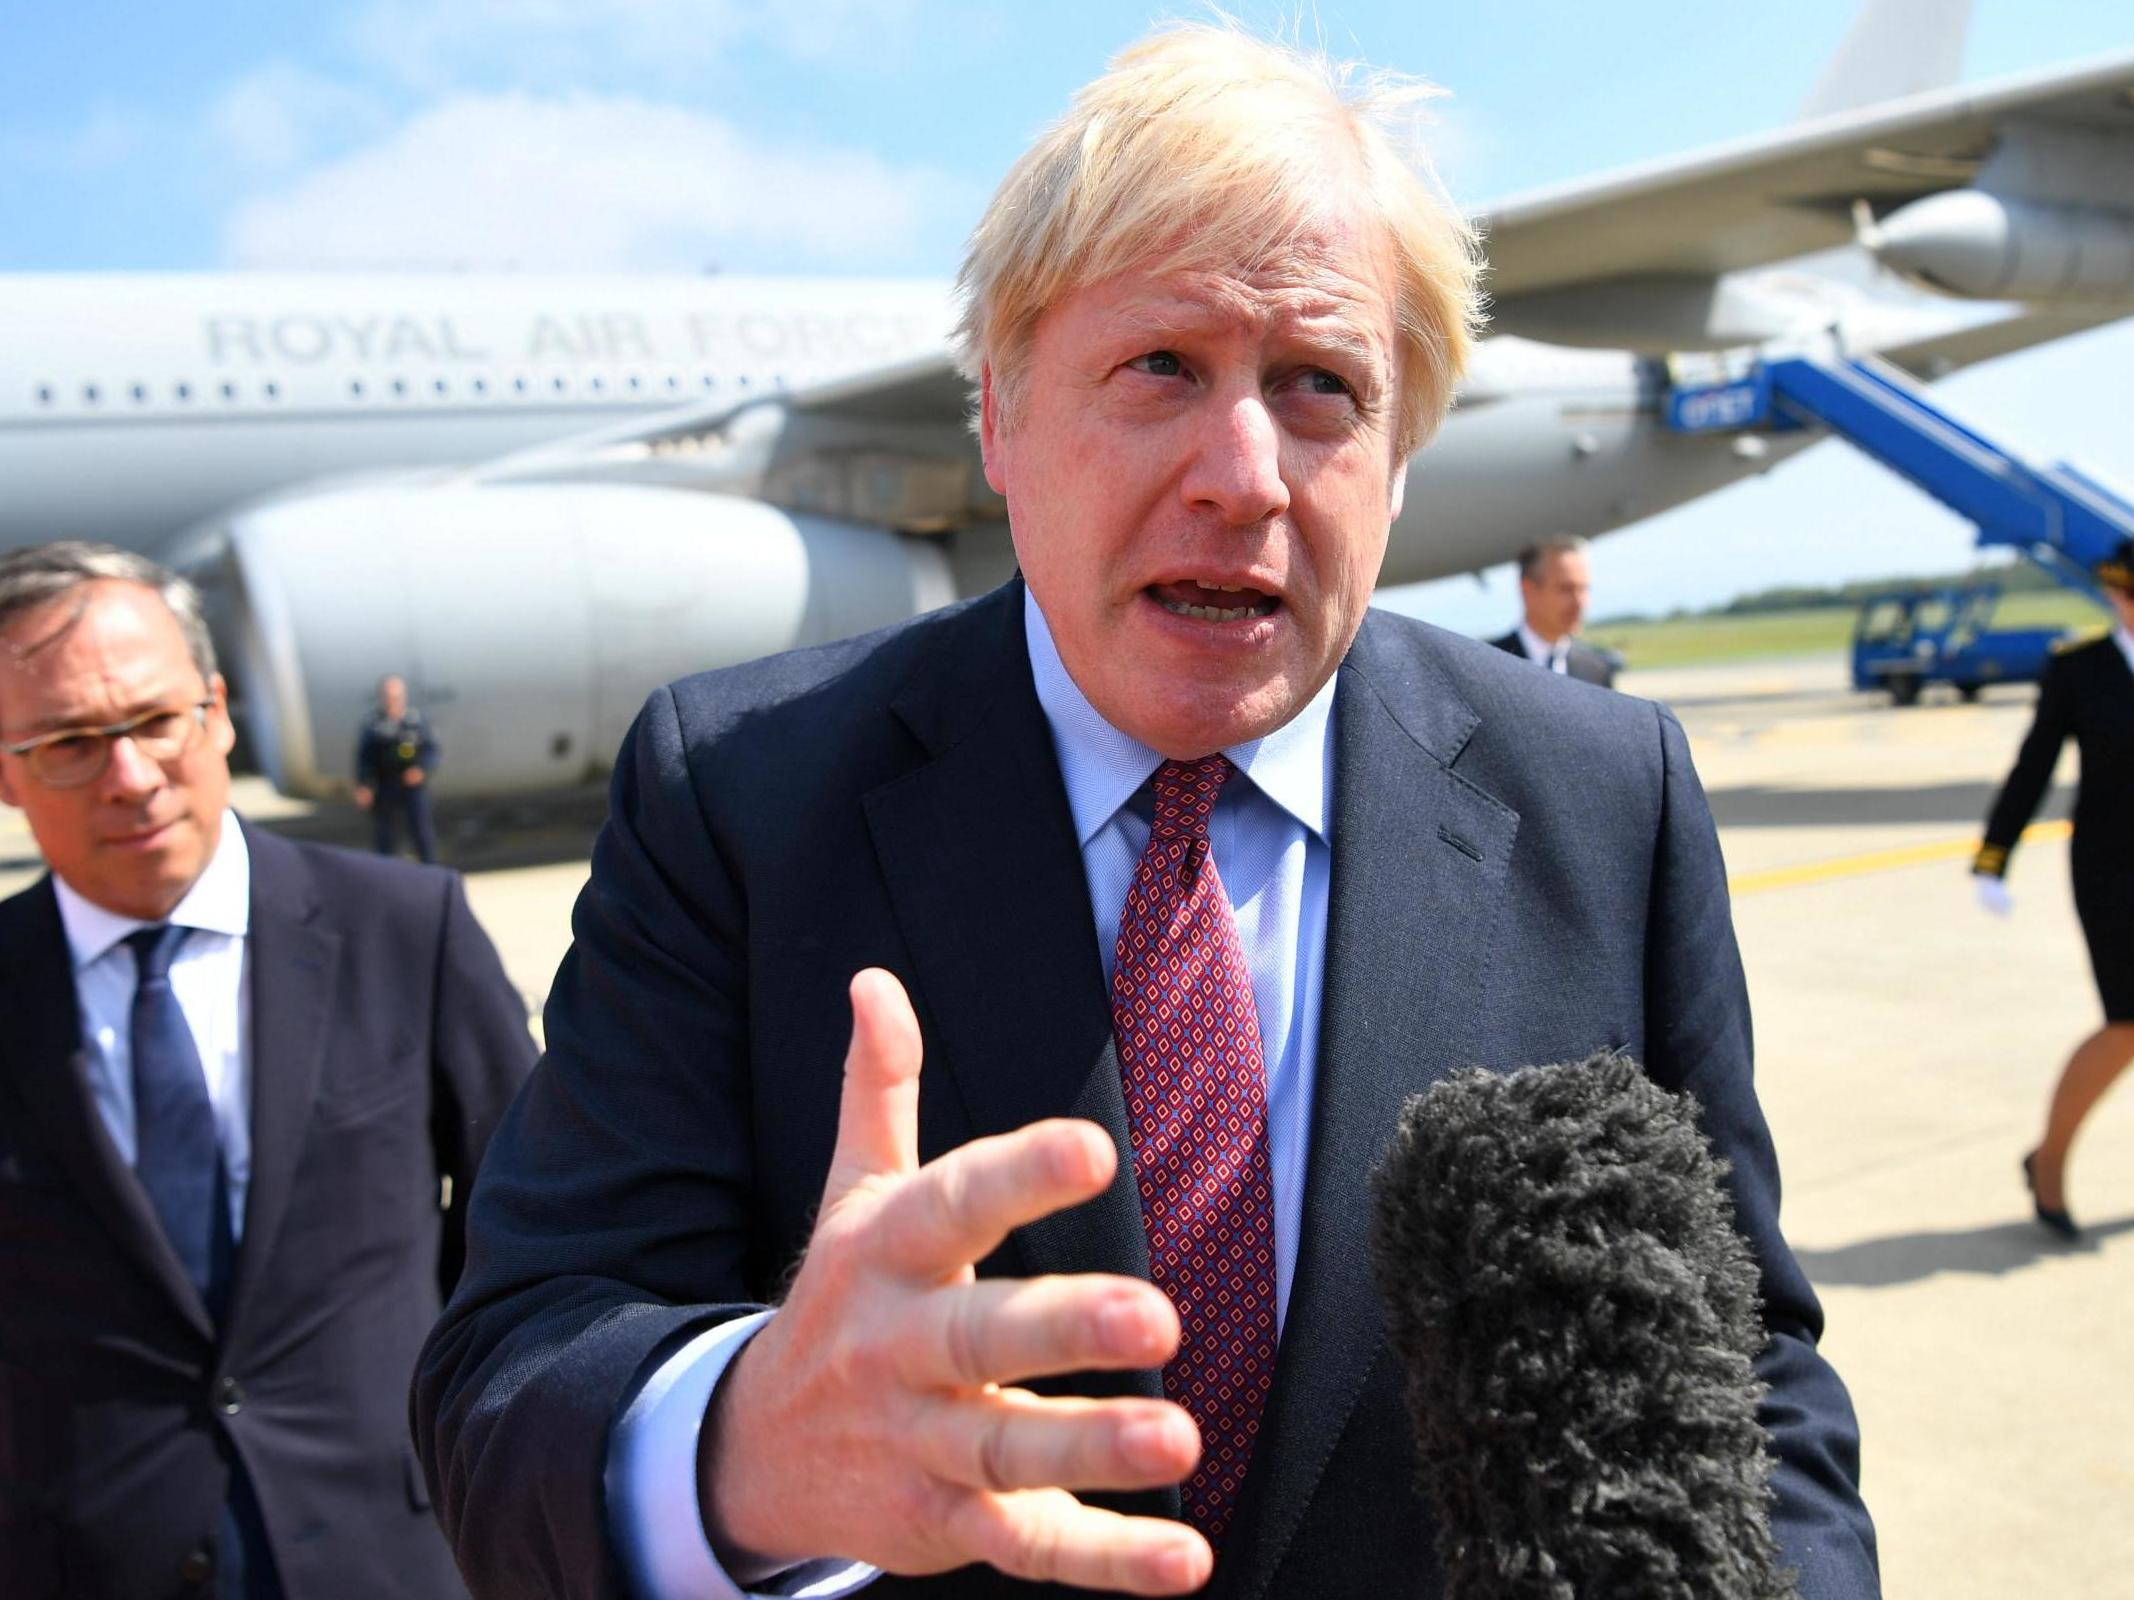 Boris Johnson expects EU talks to replace Irish backstop plan 'in the coming weeks'